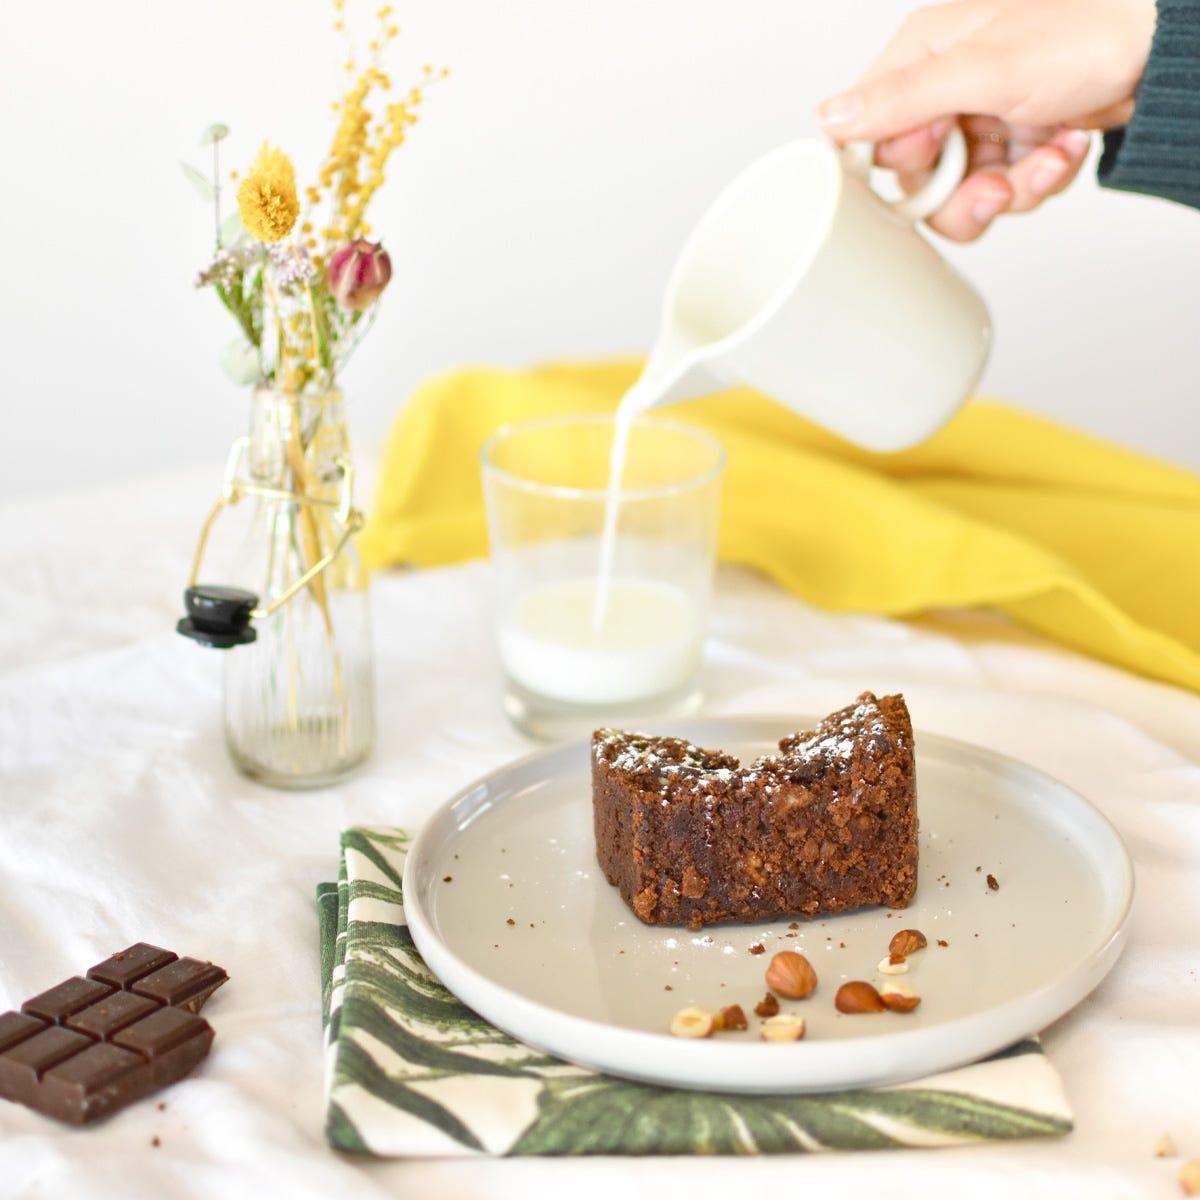 ¡Un bizcoho de chocolate y avellana que querréis degustar cada finde!